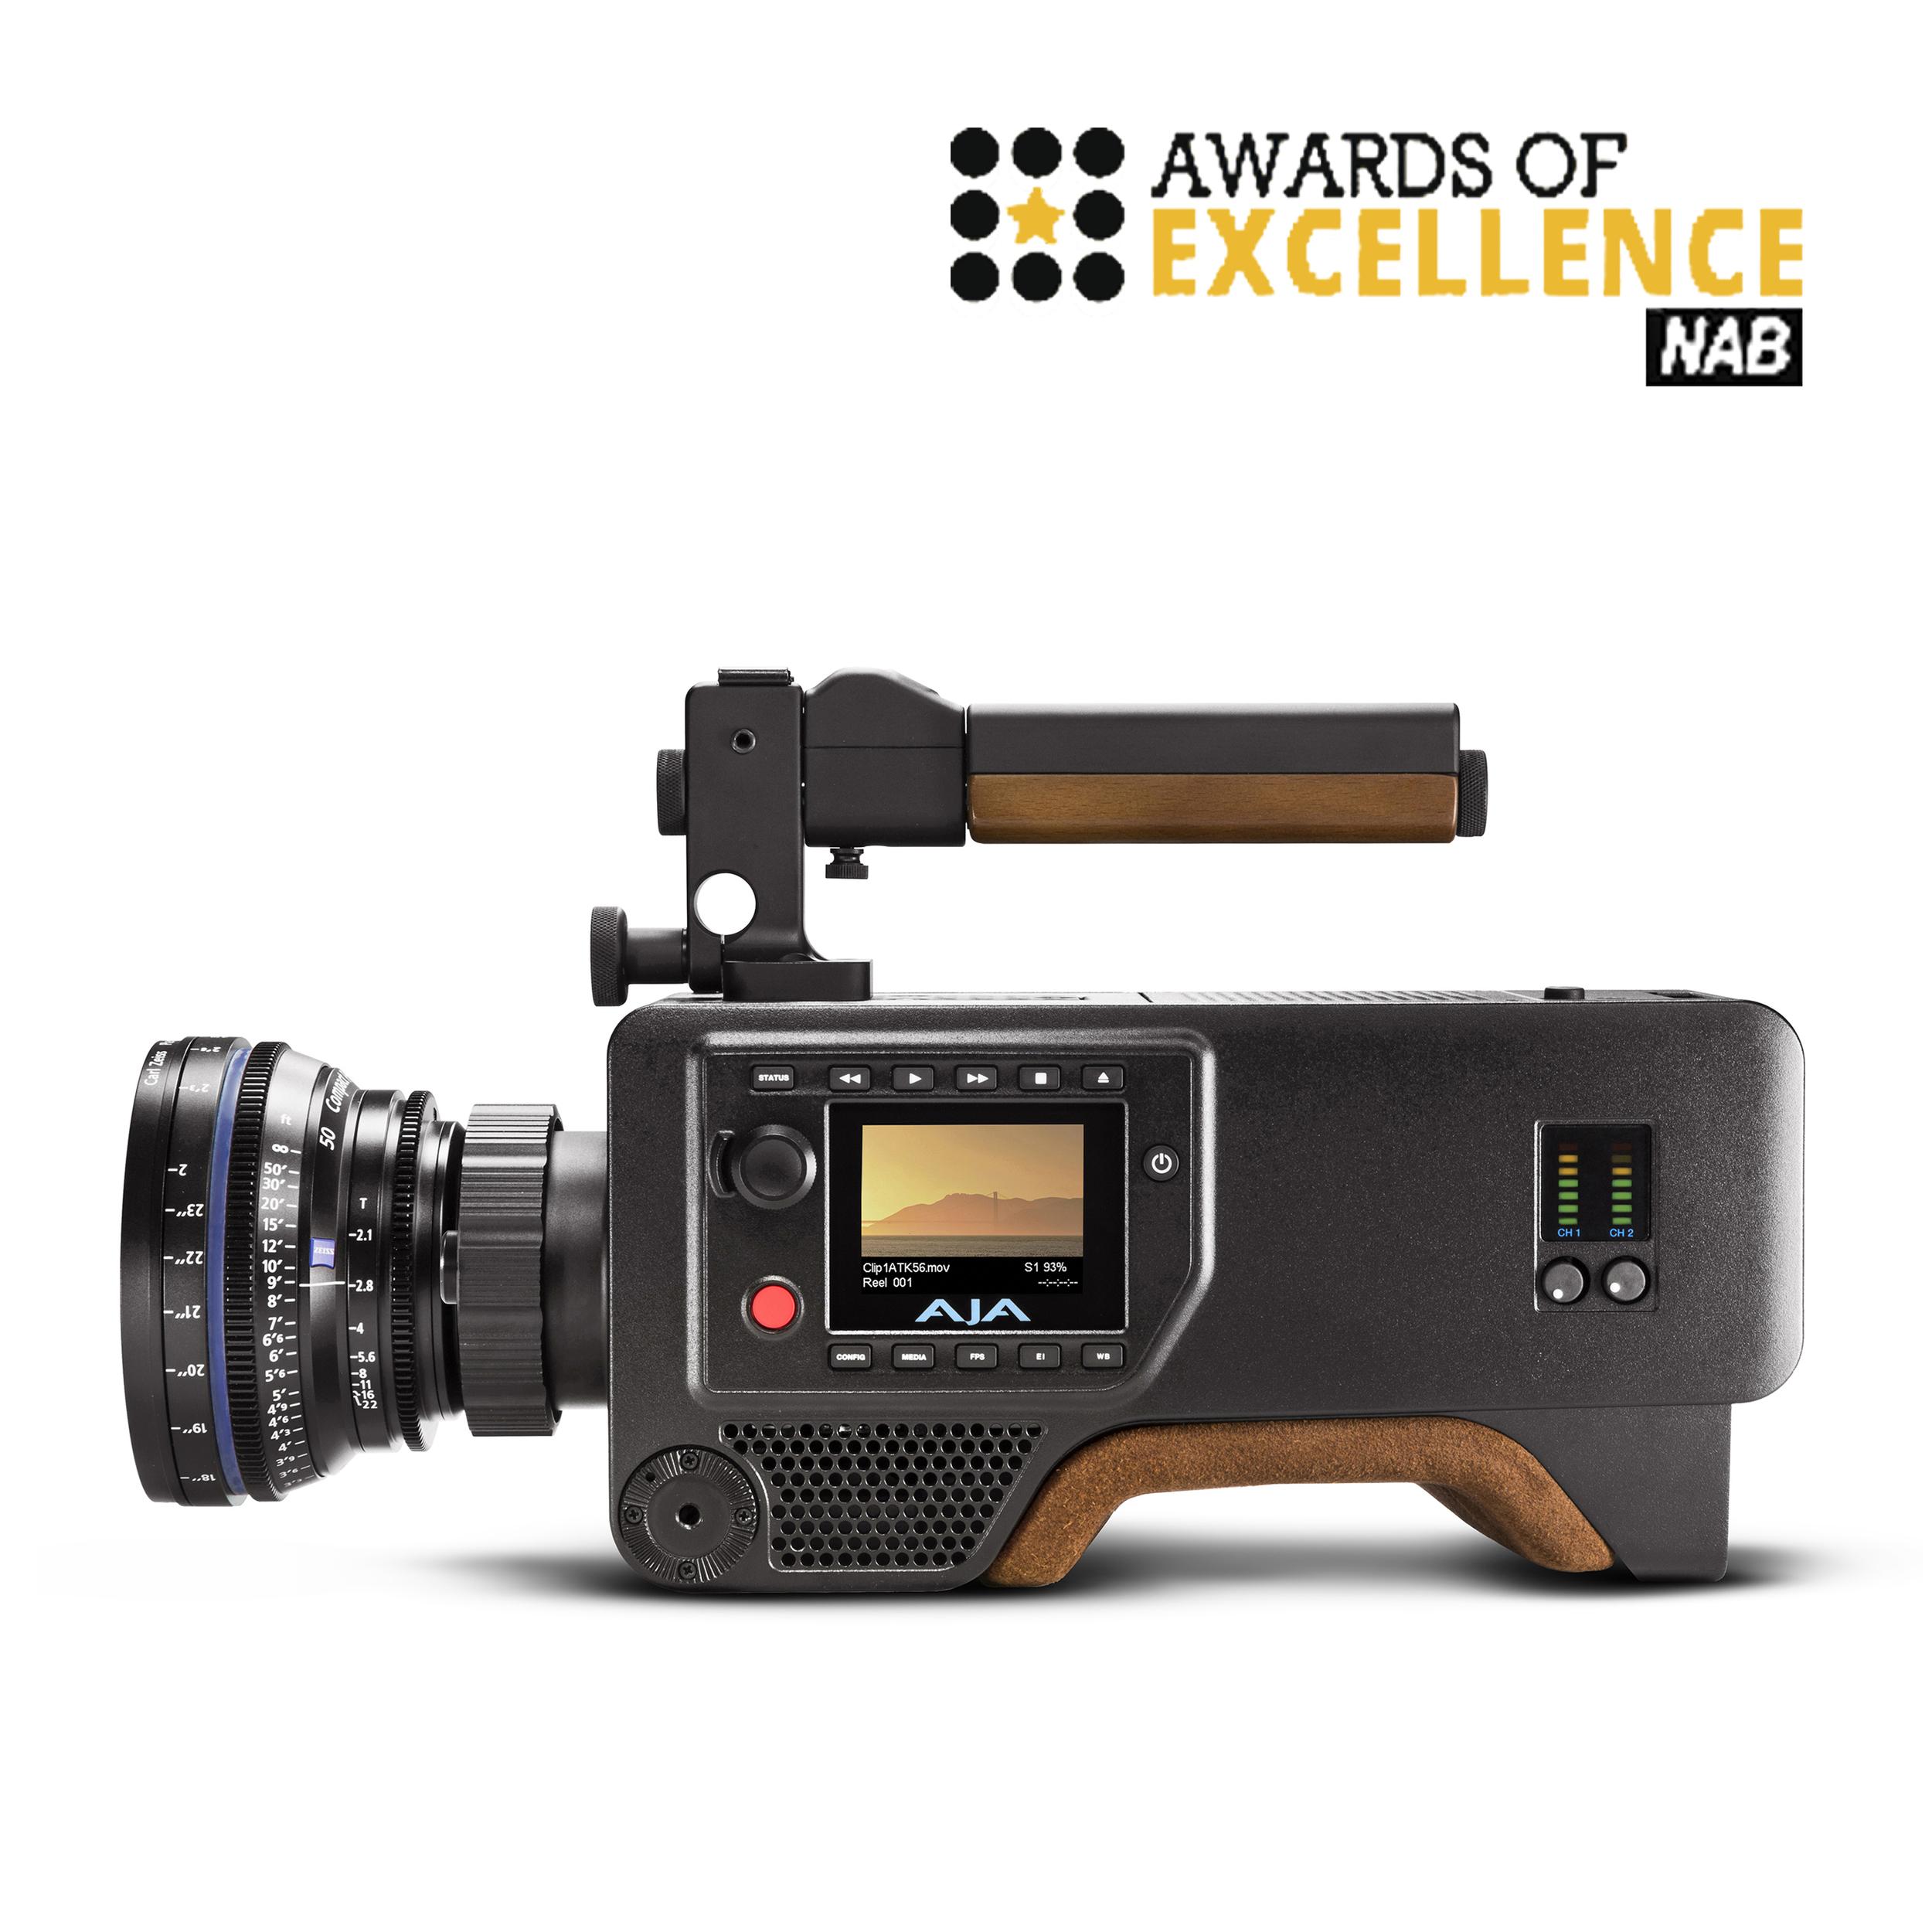 AJA Cion 4K Production Camera   National Association of Broadcasters (NAB) Awards – Award or Excellence